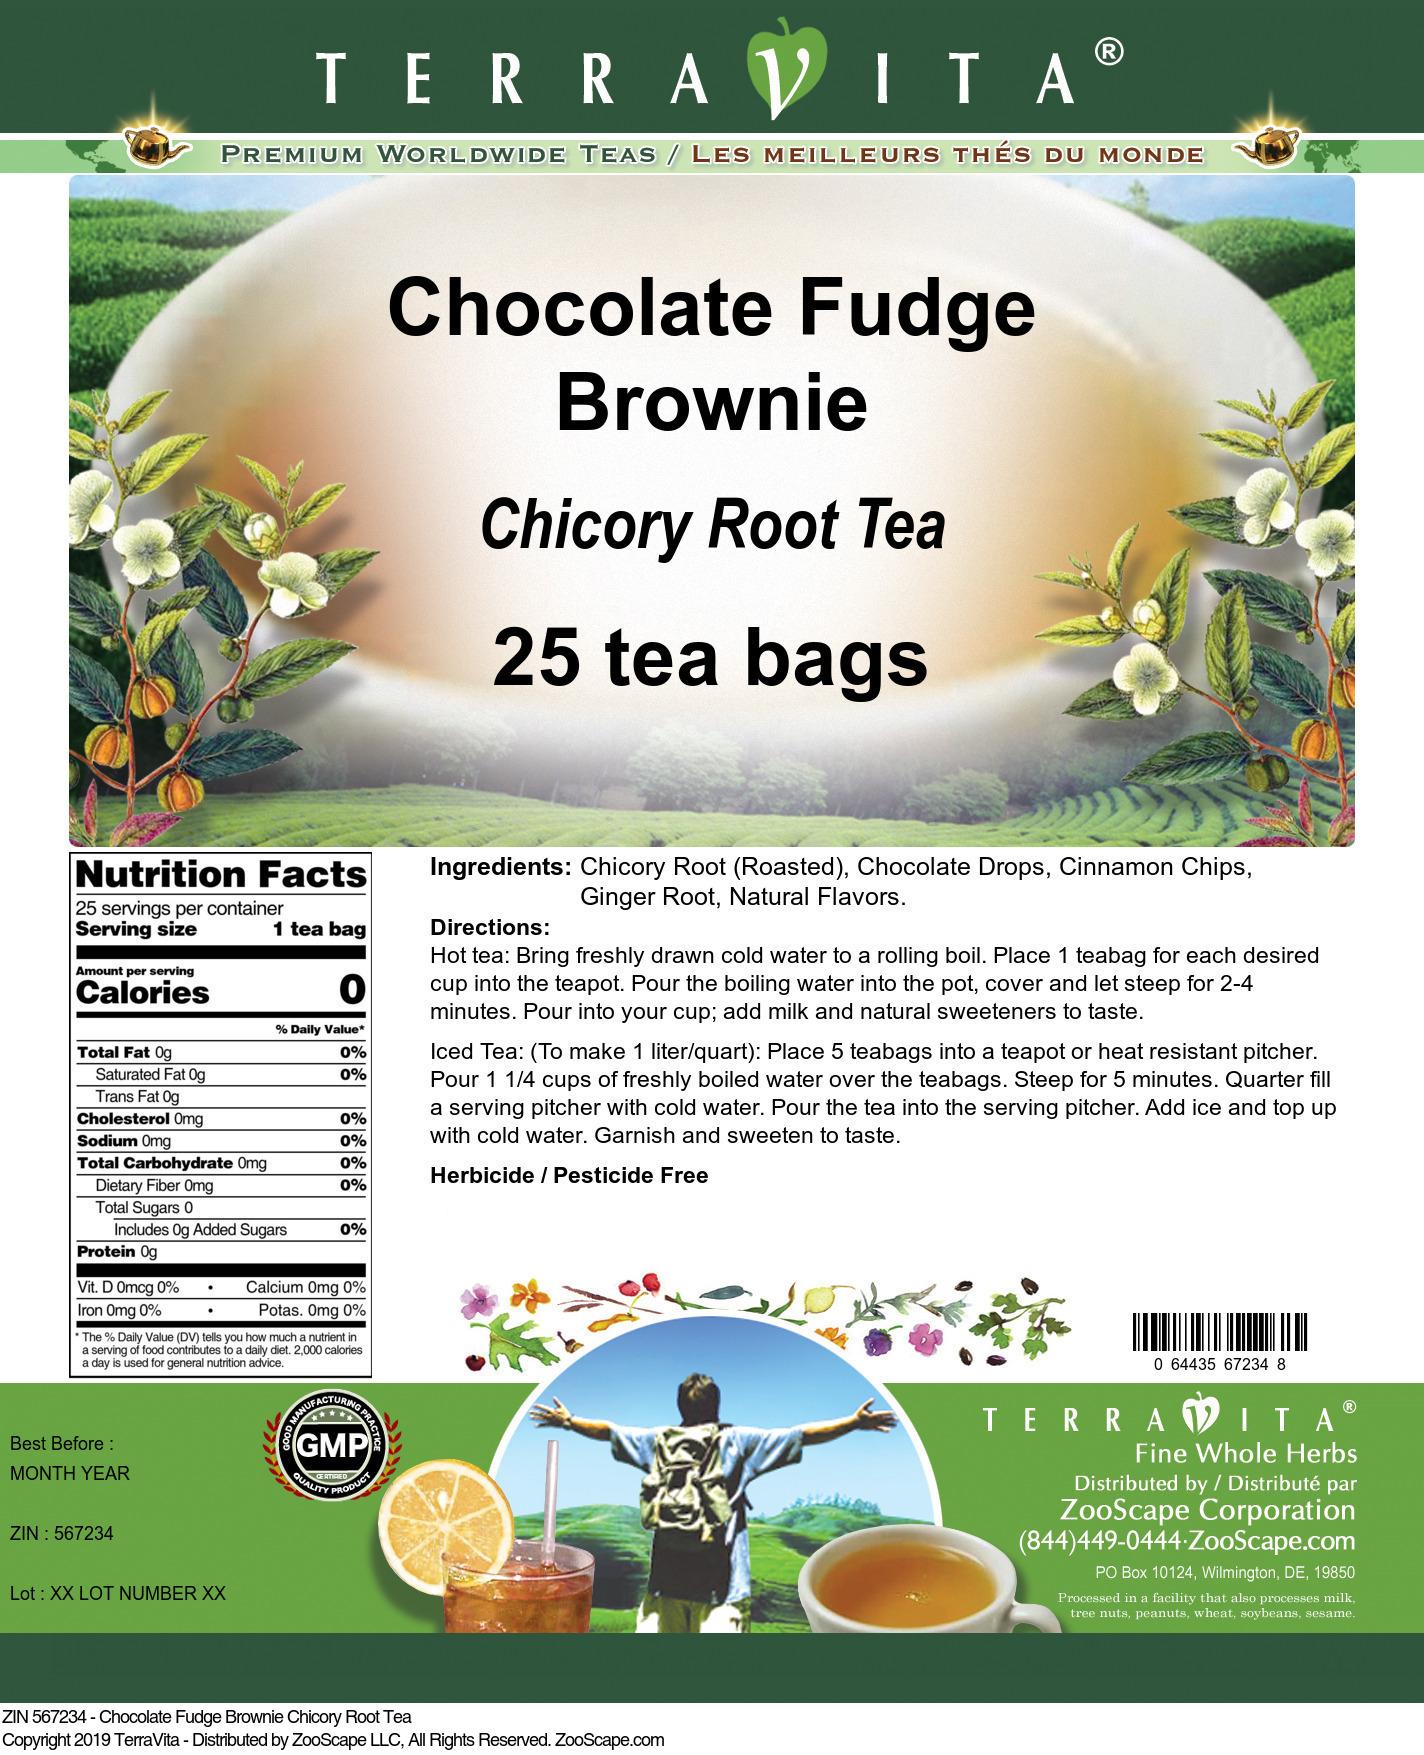 Chocolate Fudge Brownie Chicory Root Tea